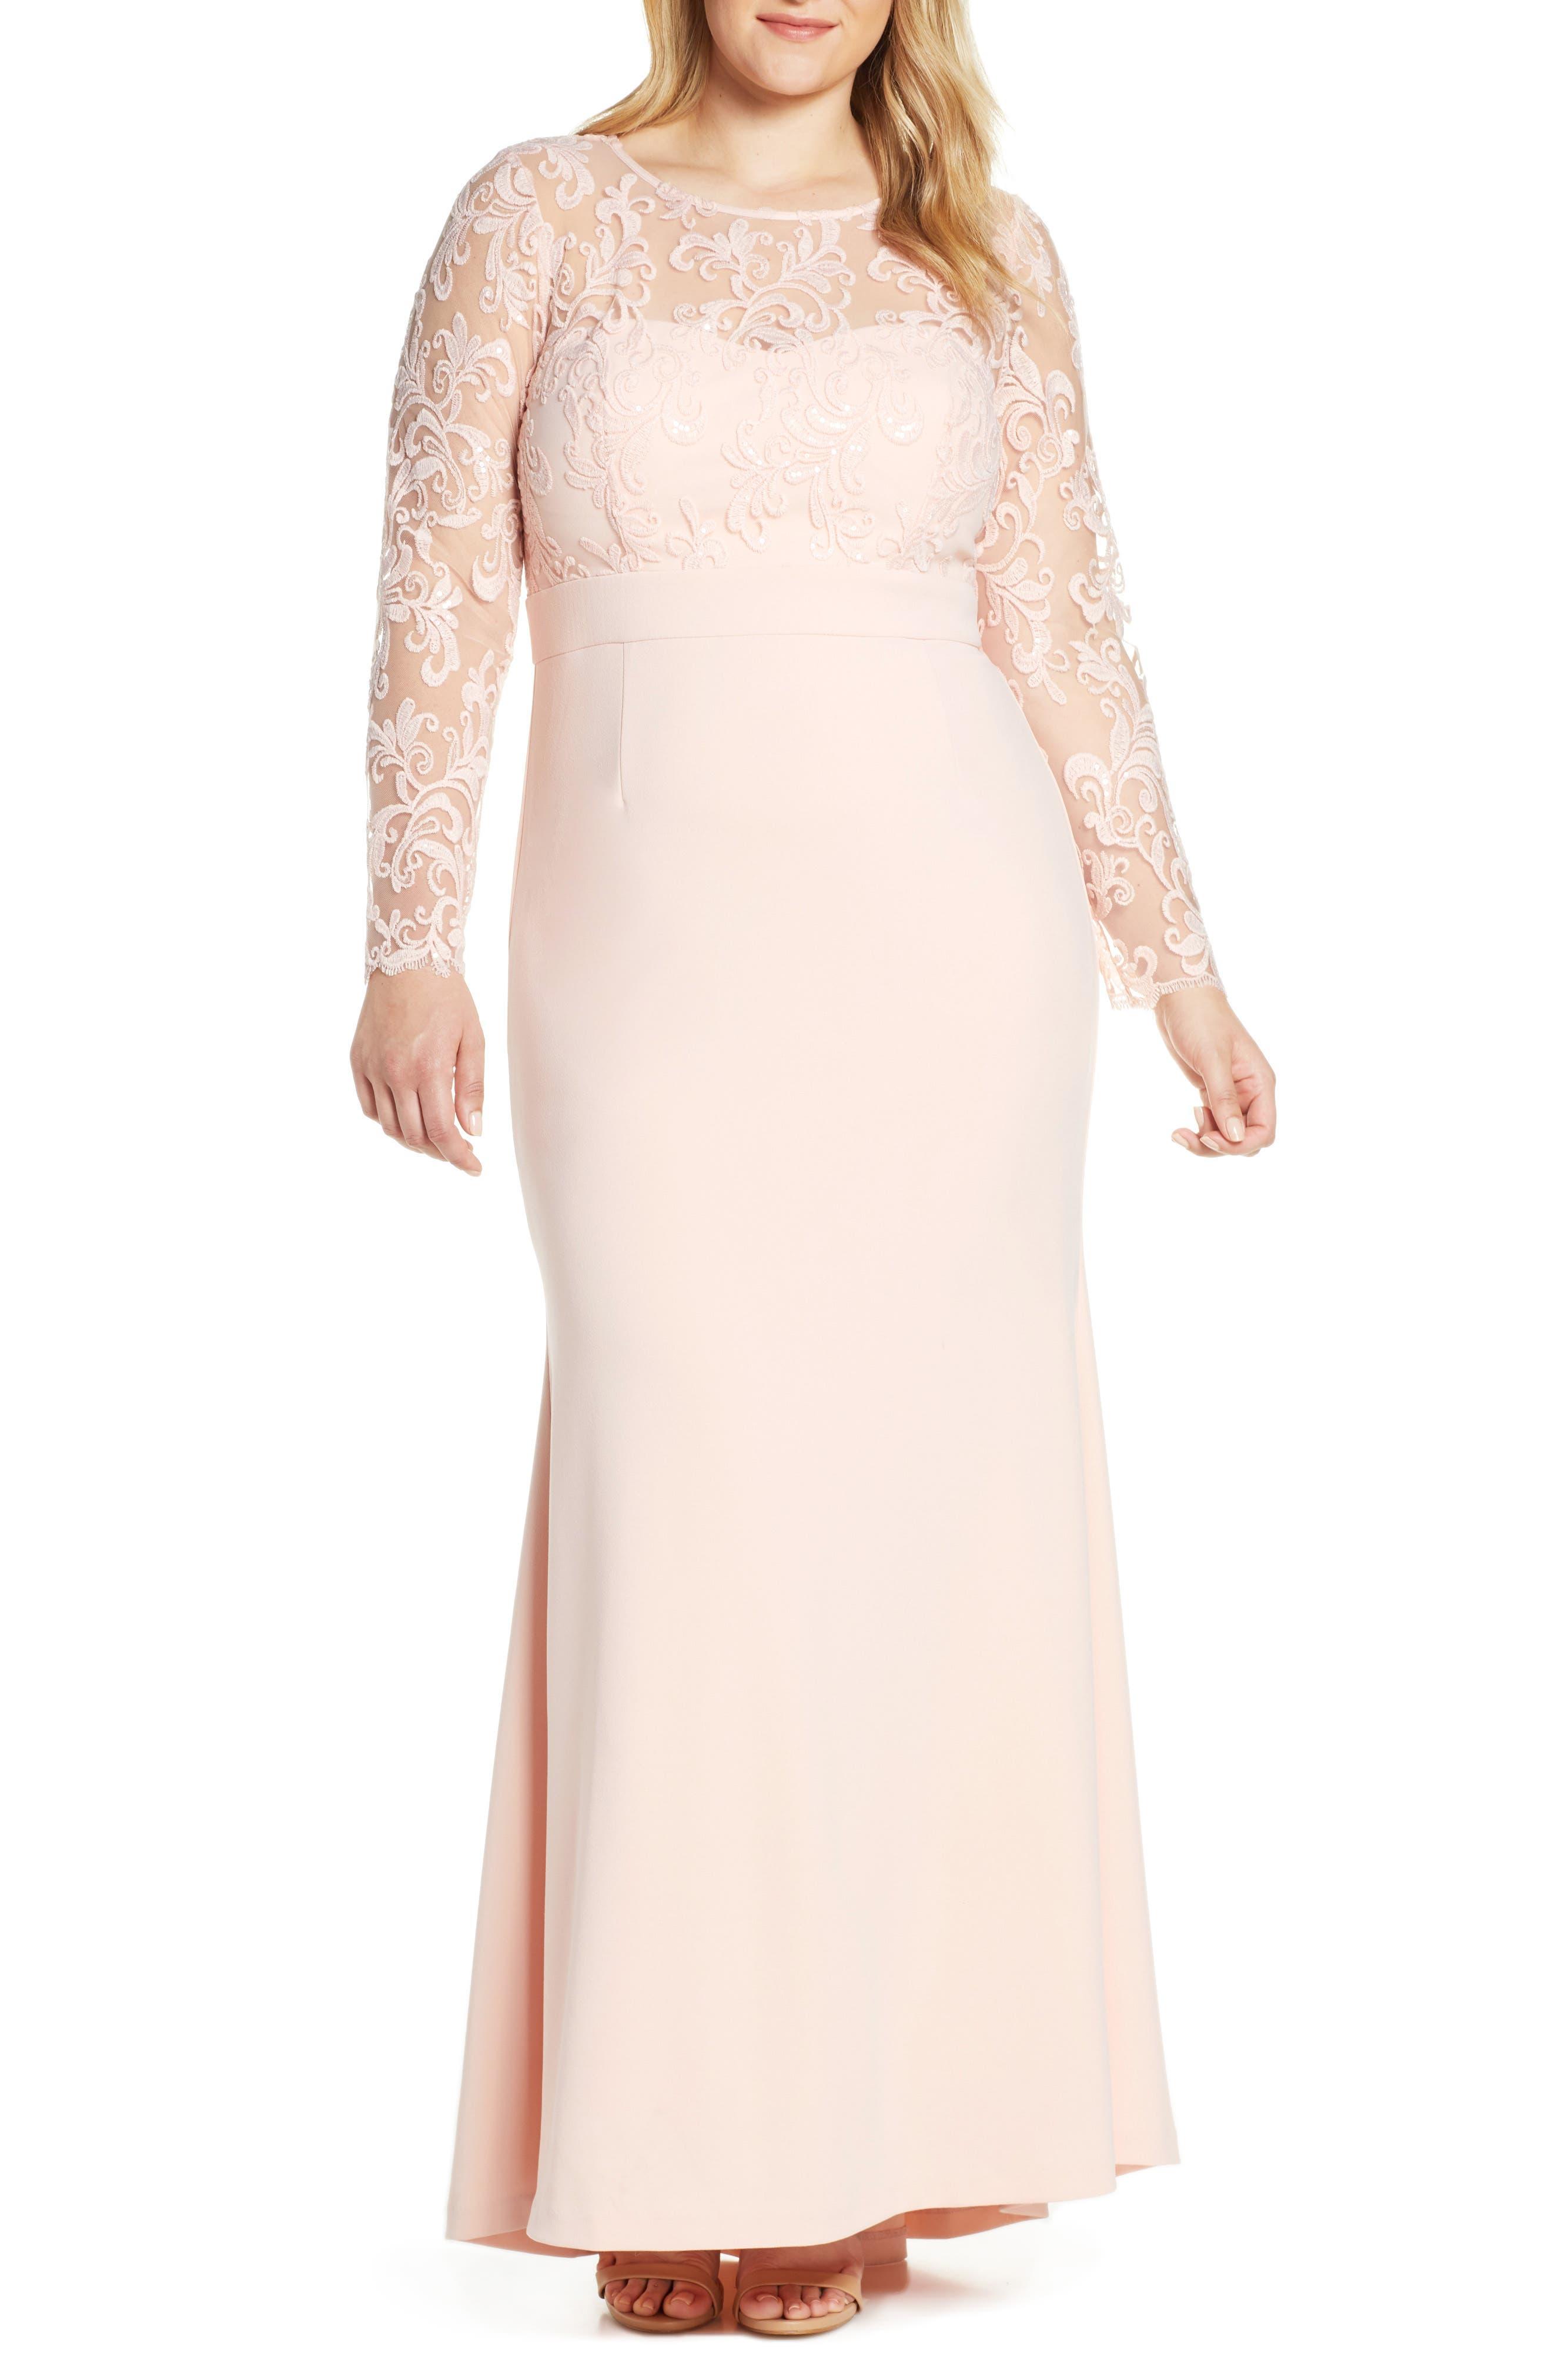 ELIZA J, Embroidered Bodice Crepe Evening Dress, Alternate thumbnail 2, color, BLUSH